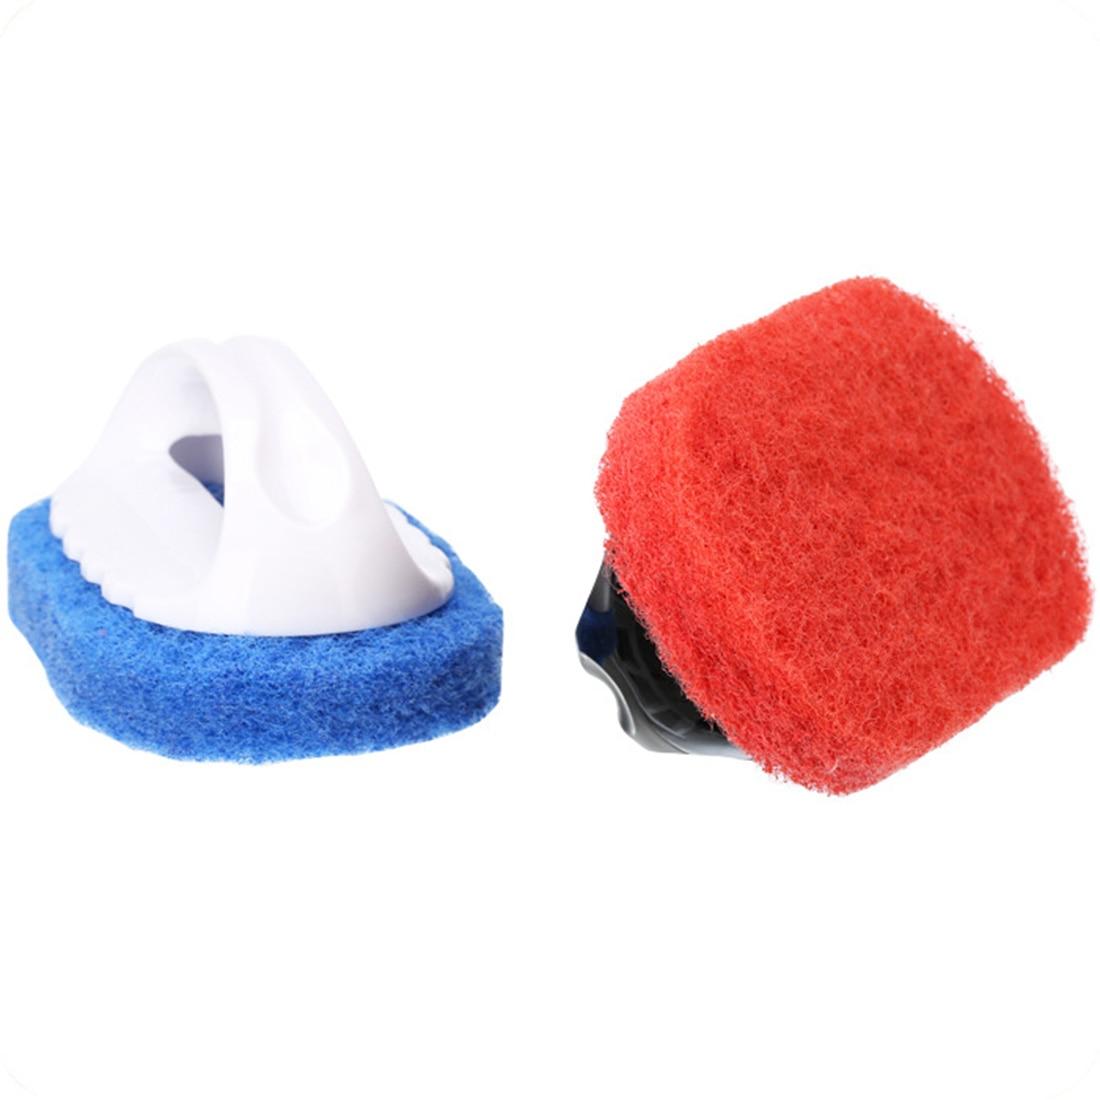 Economic Household Supplies Handle Hard Sponge Cleaning Brush Sanitary Tools Brusher